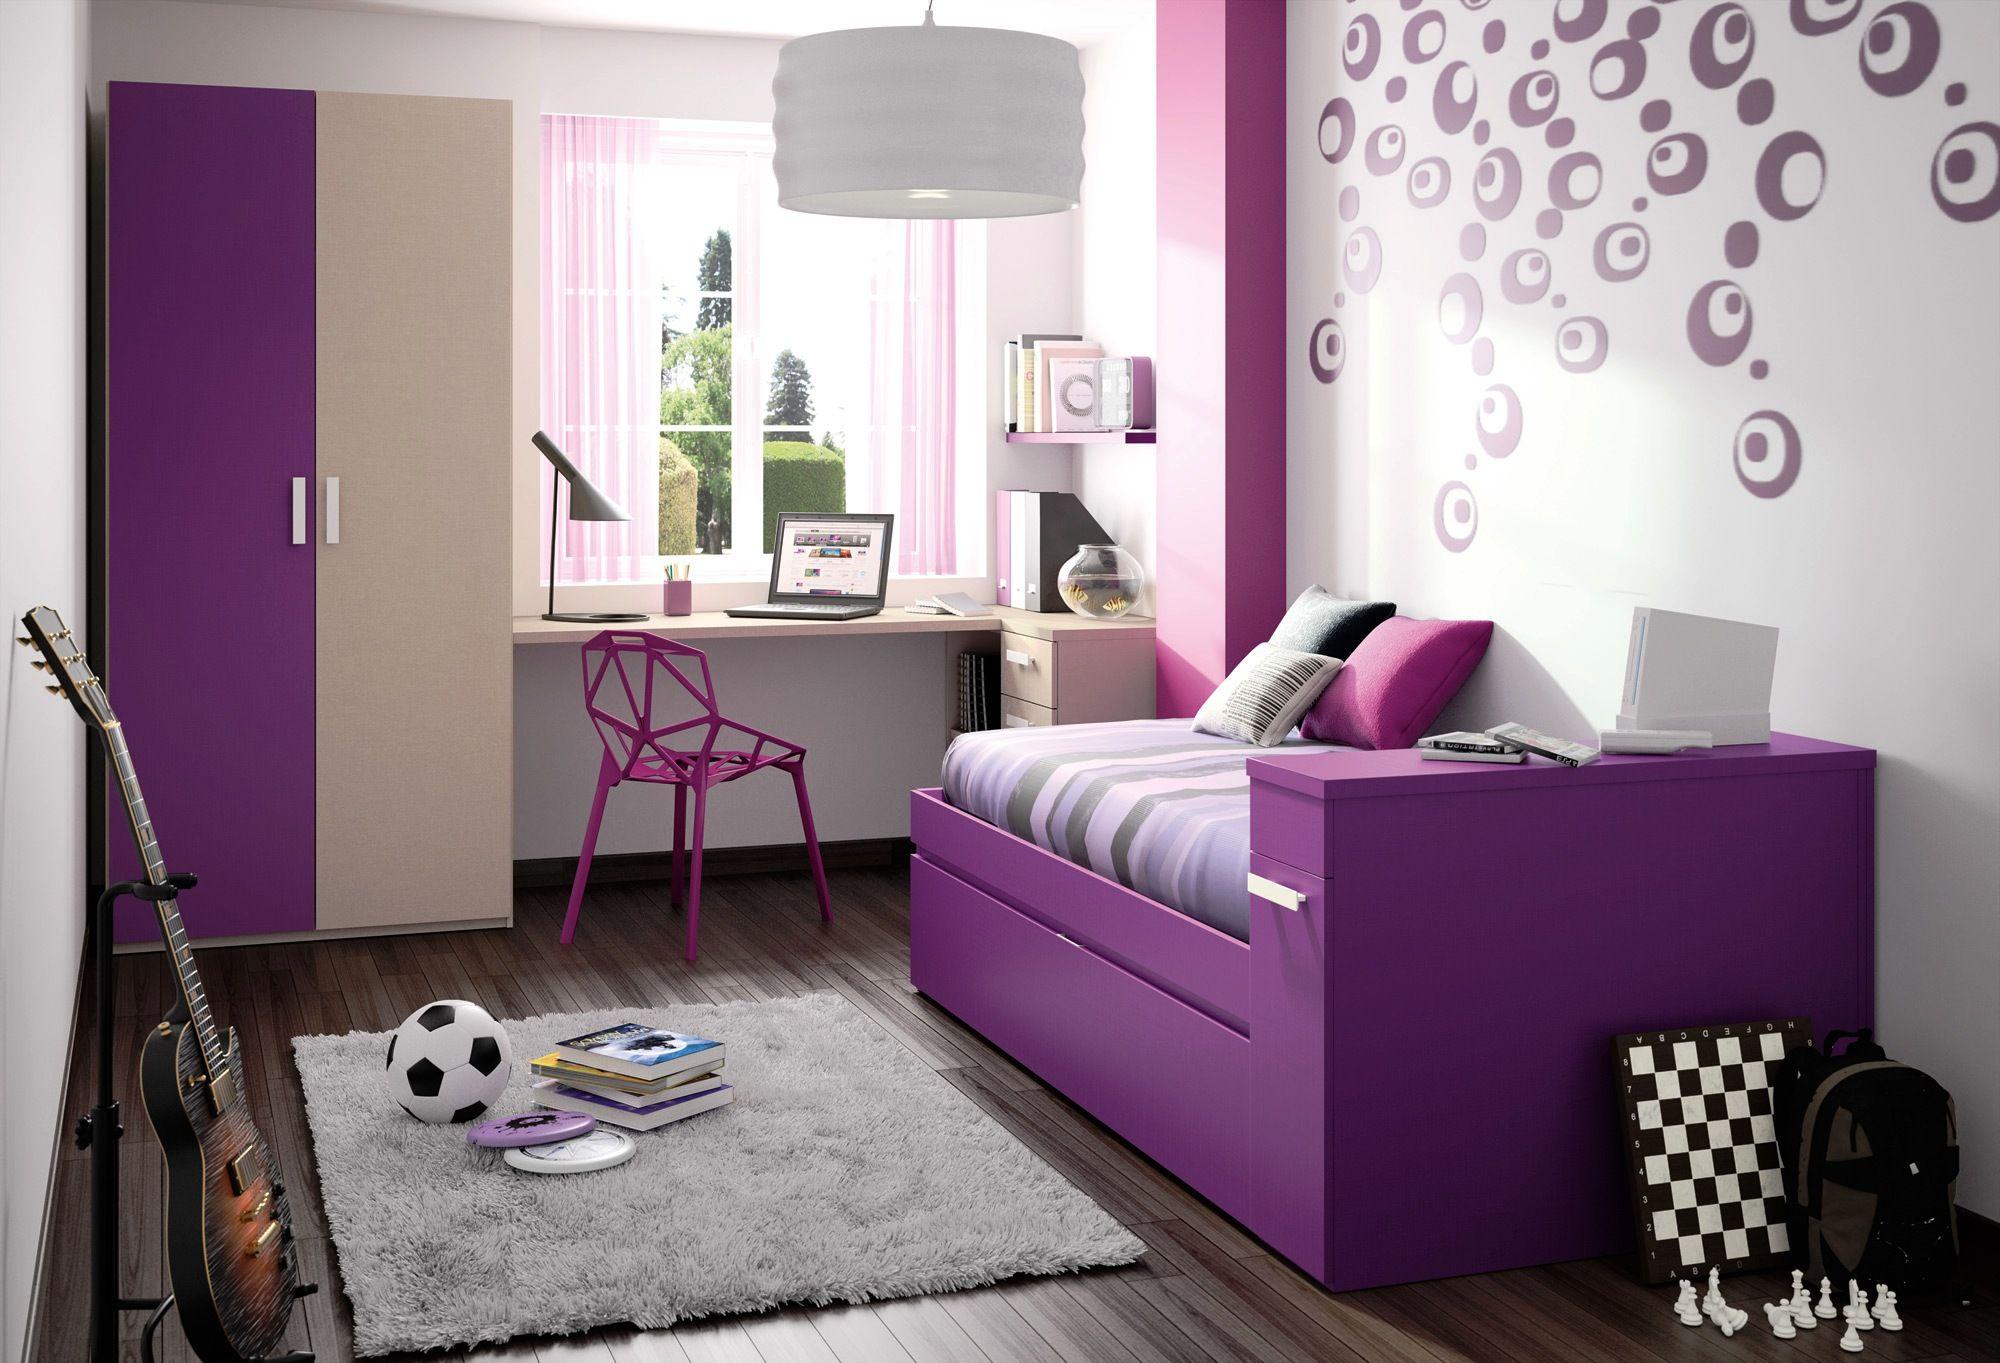 extraordinary bedroom ideas purple walls | Pin on Bedroom